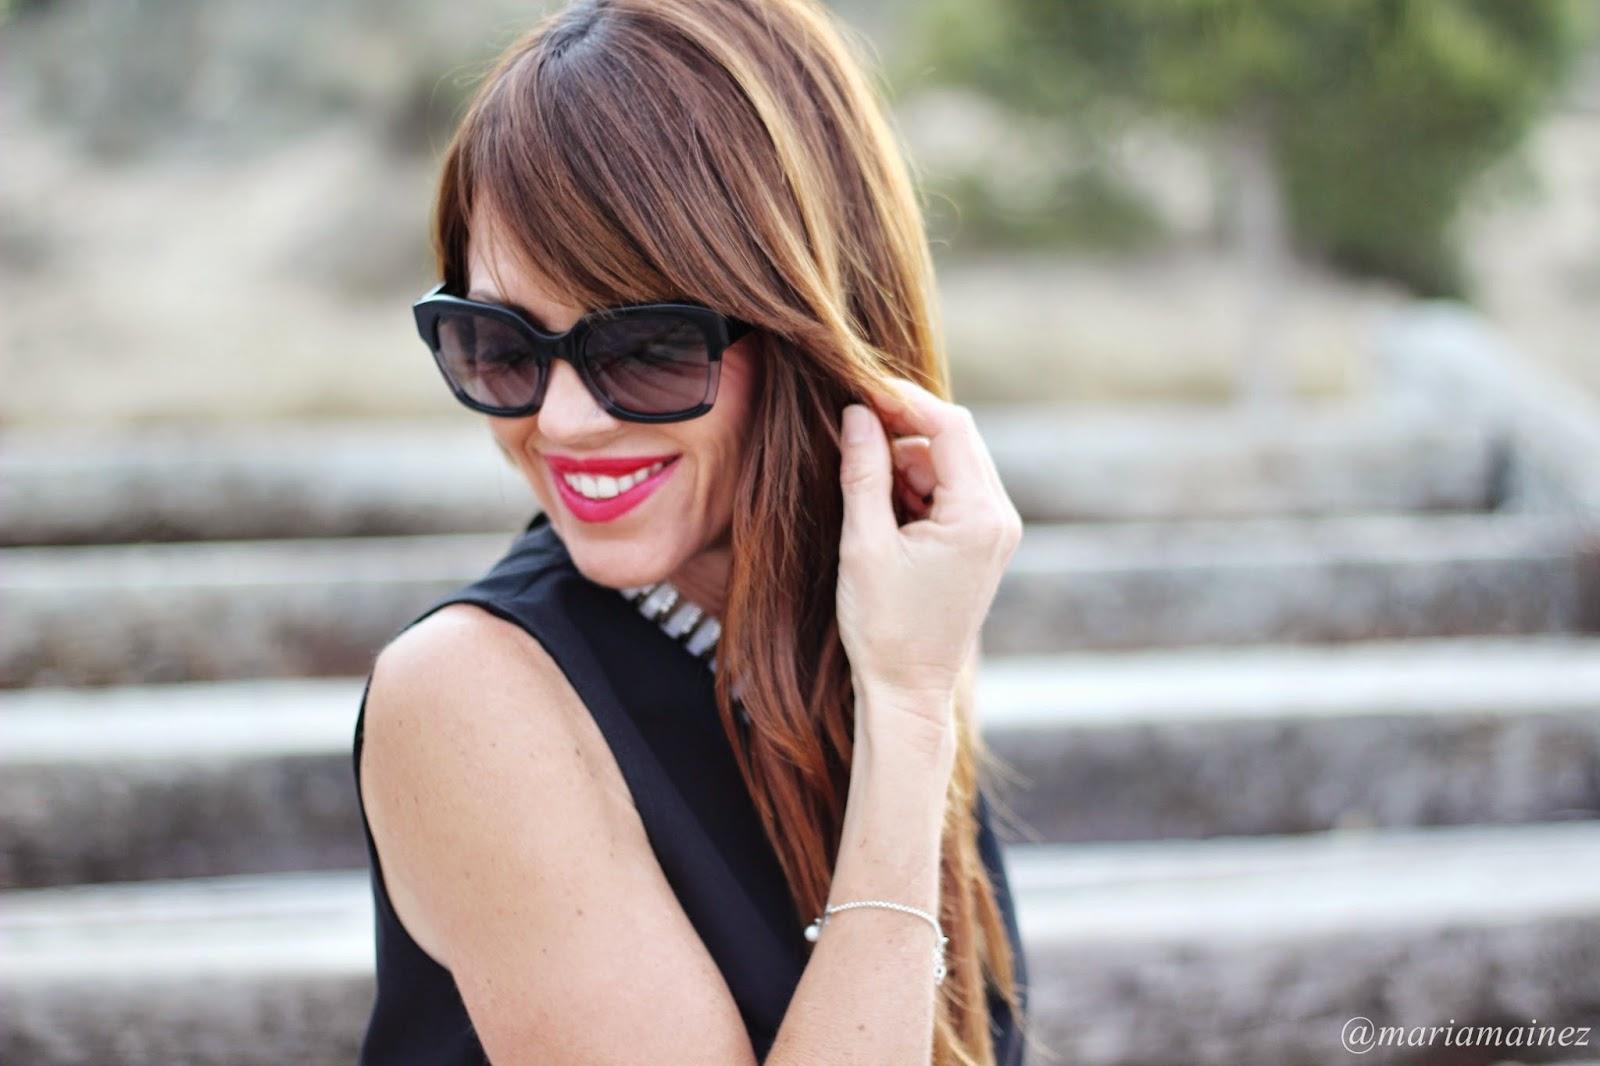 Sunnies - Tendencias gafas de sol 2015 - fashion blogger